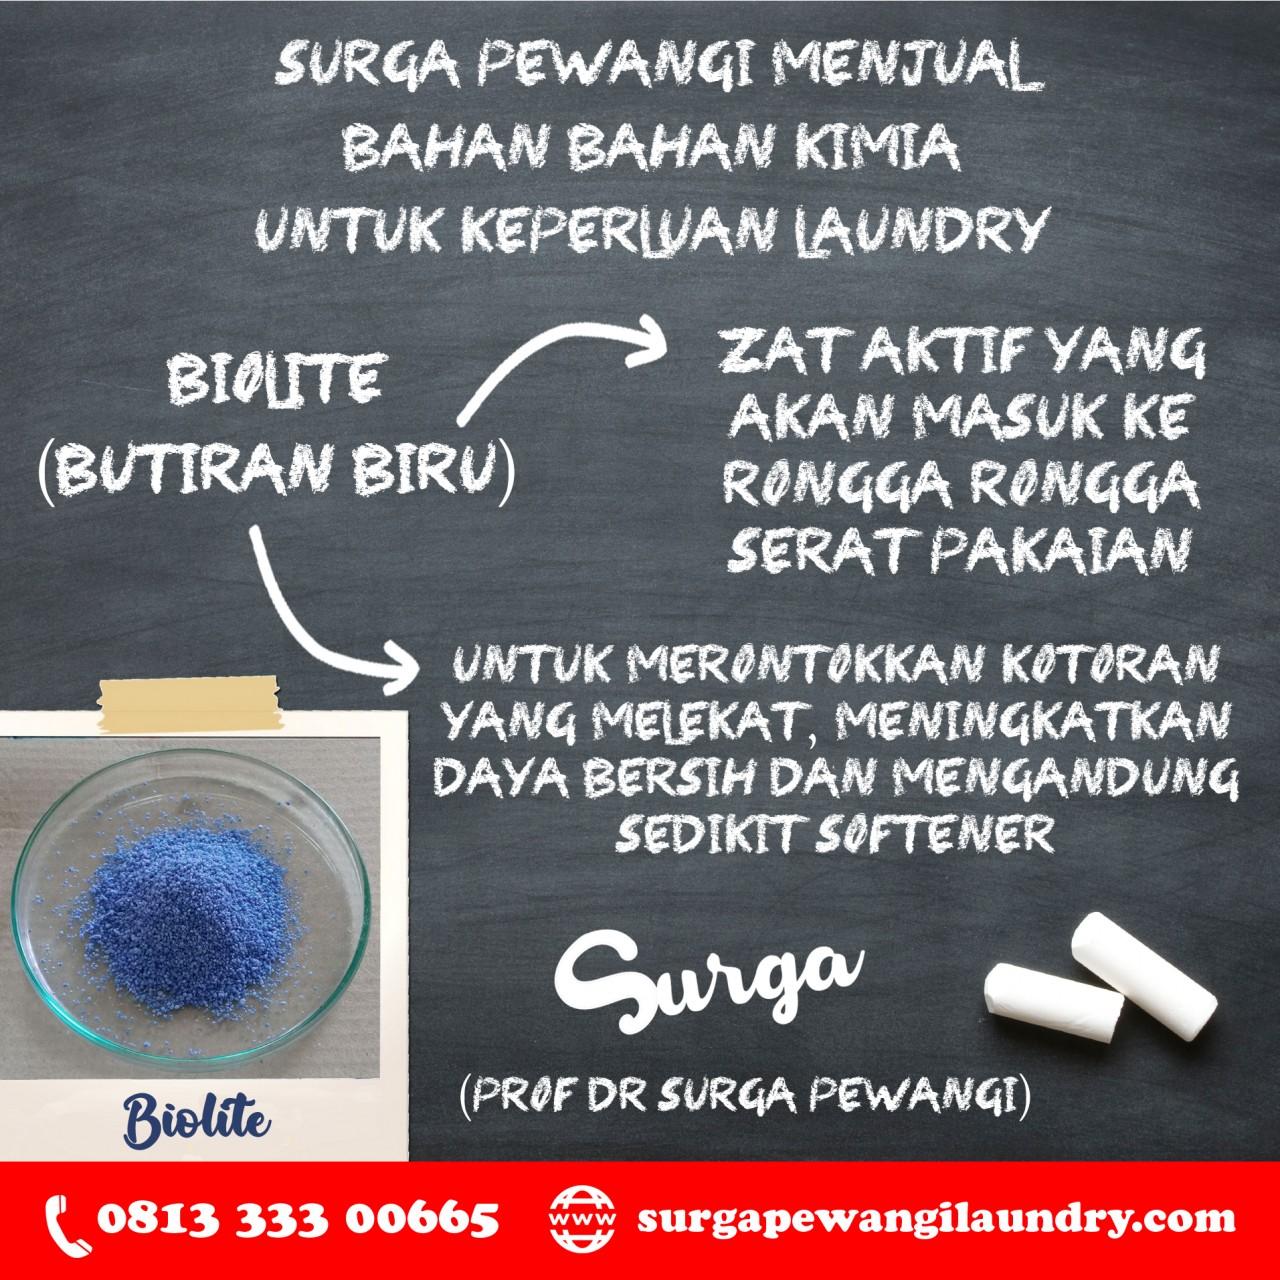 Biolite 1280x1280 - Deterjen Laundry Hotel - Rahasia Baju Rapih Wangi Mewah